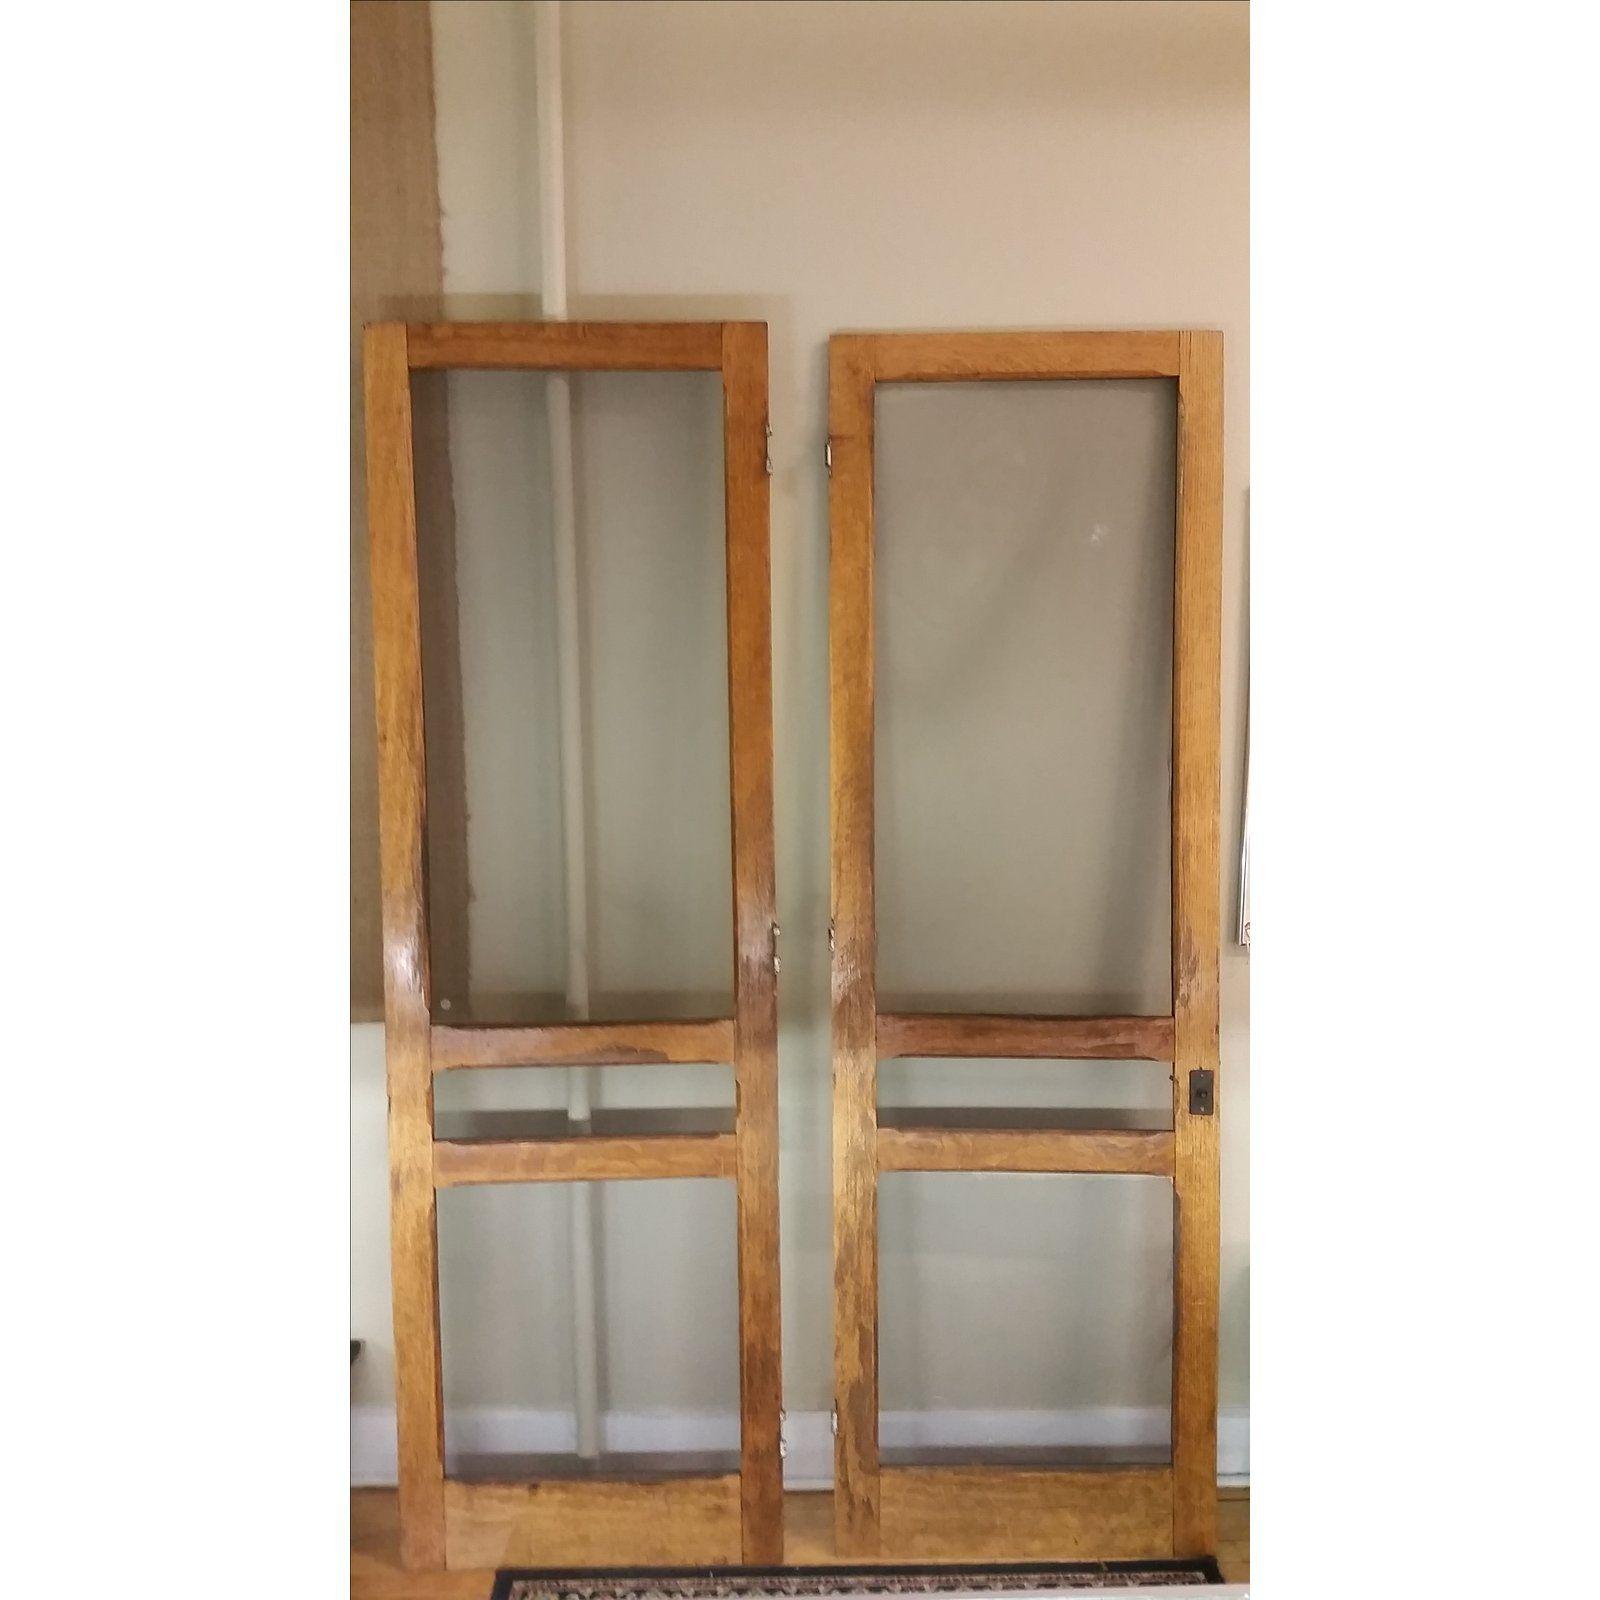 Tiger oak plantation style screen doors a pair in doors